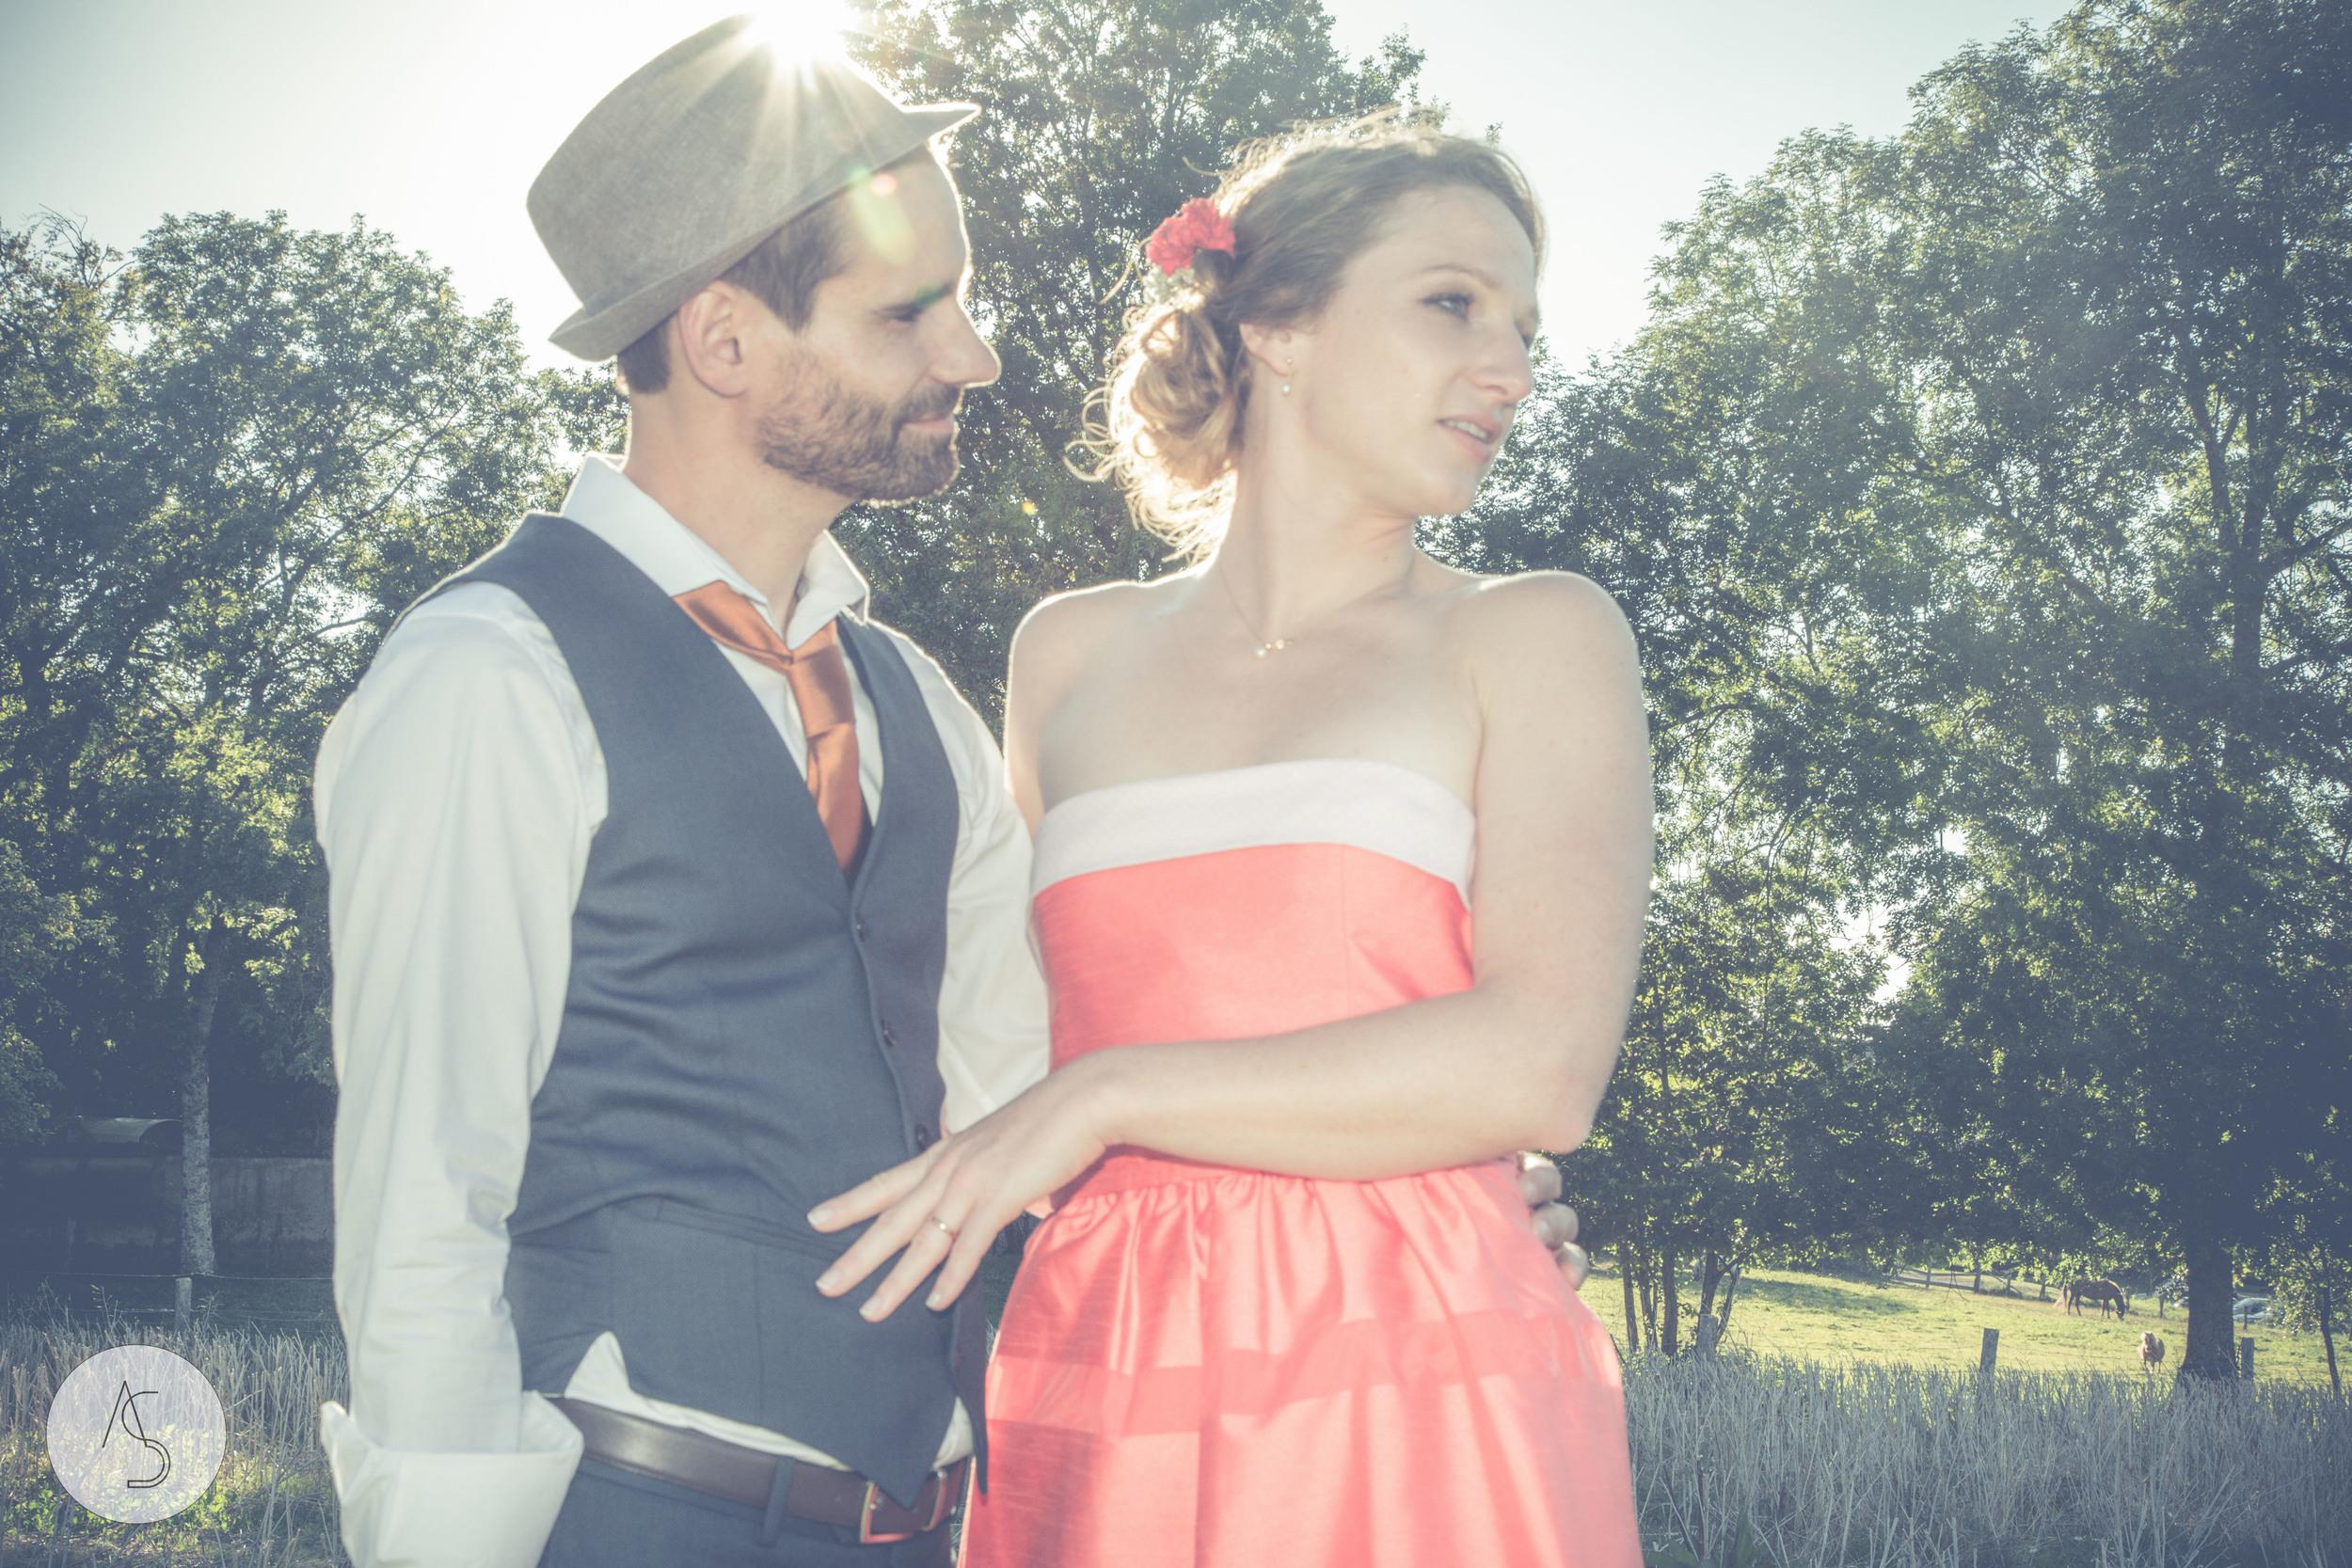 photographe mariage - Grenoble - Rhone Alpes - Adriana Salazar photo-102.jpg